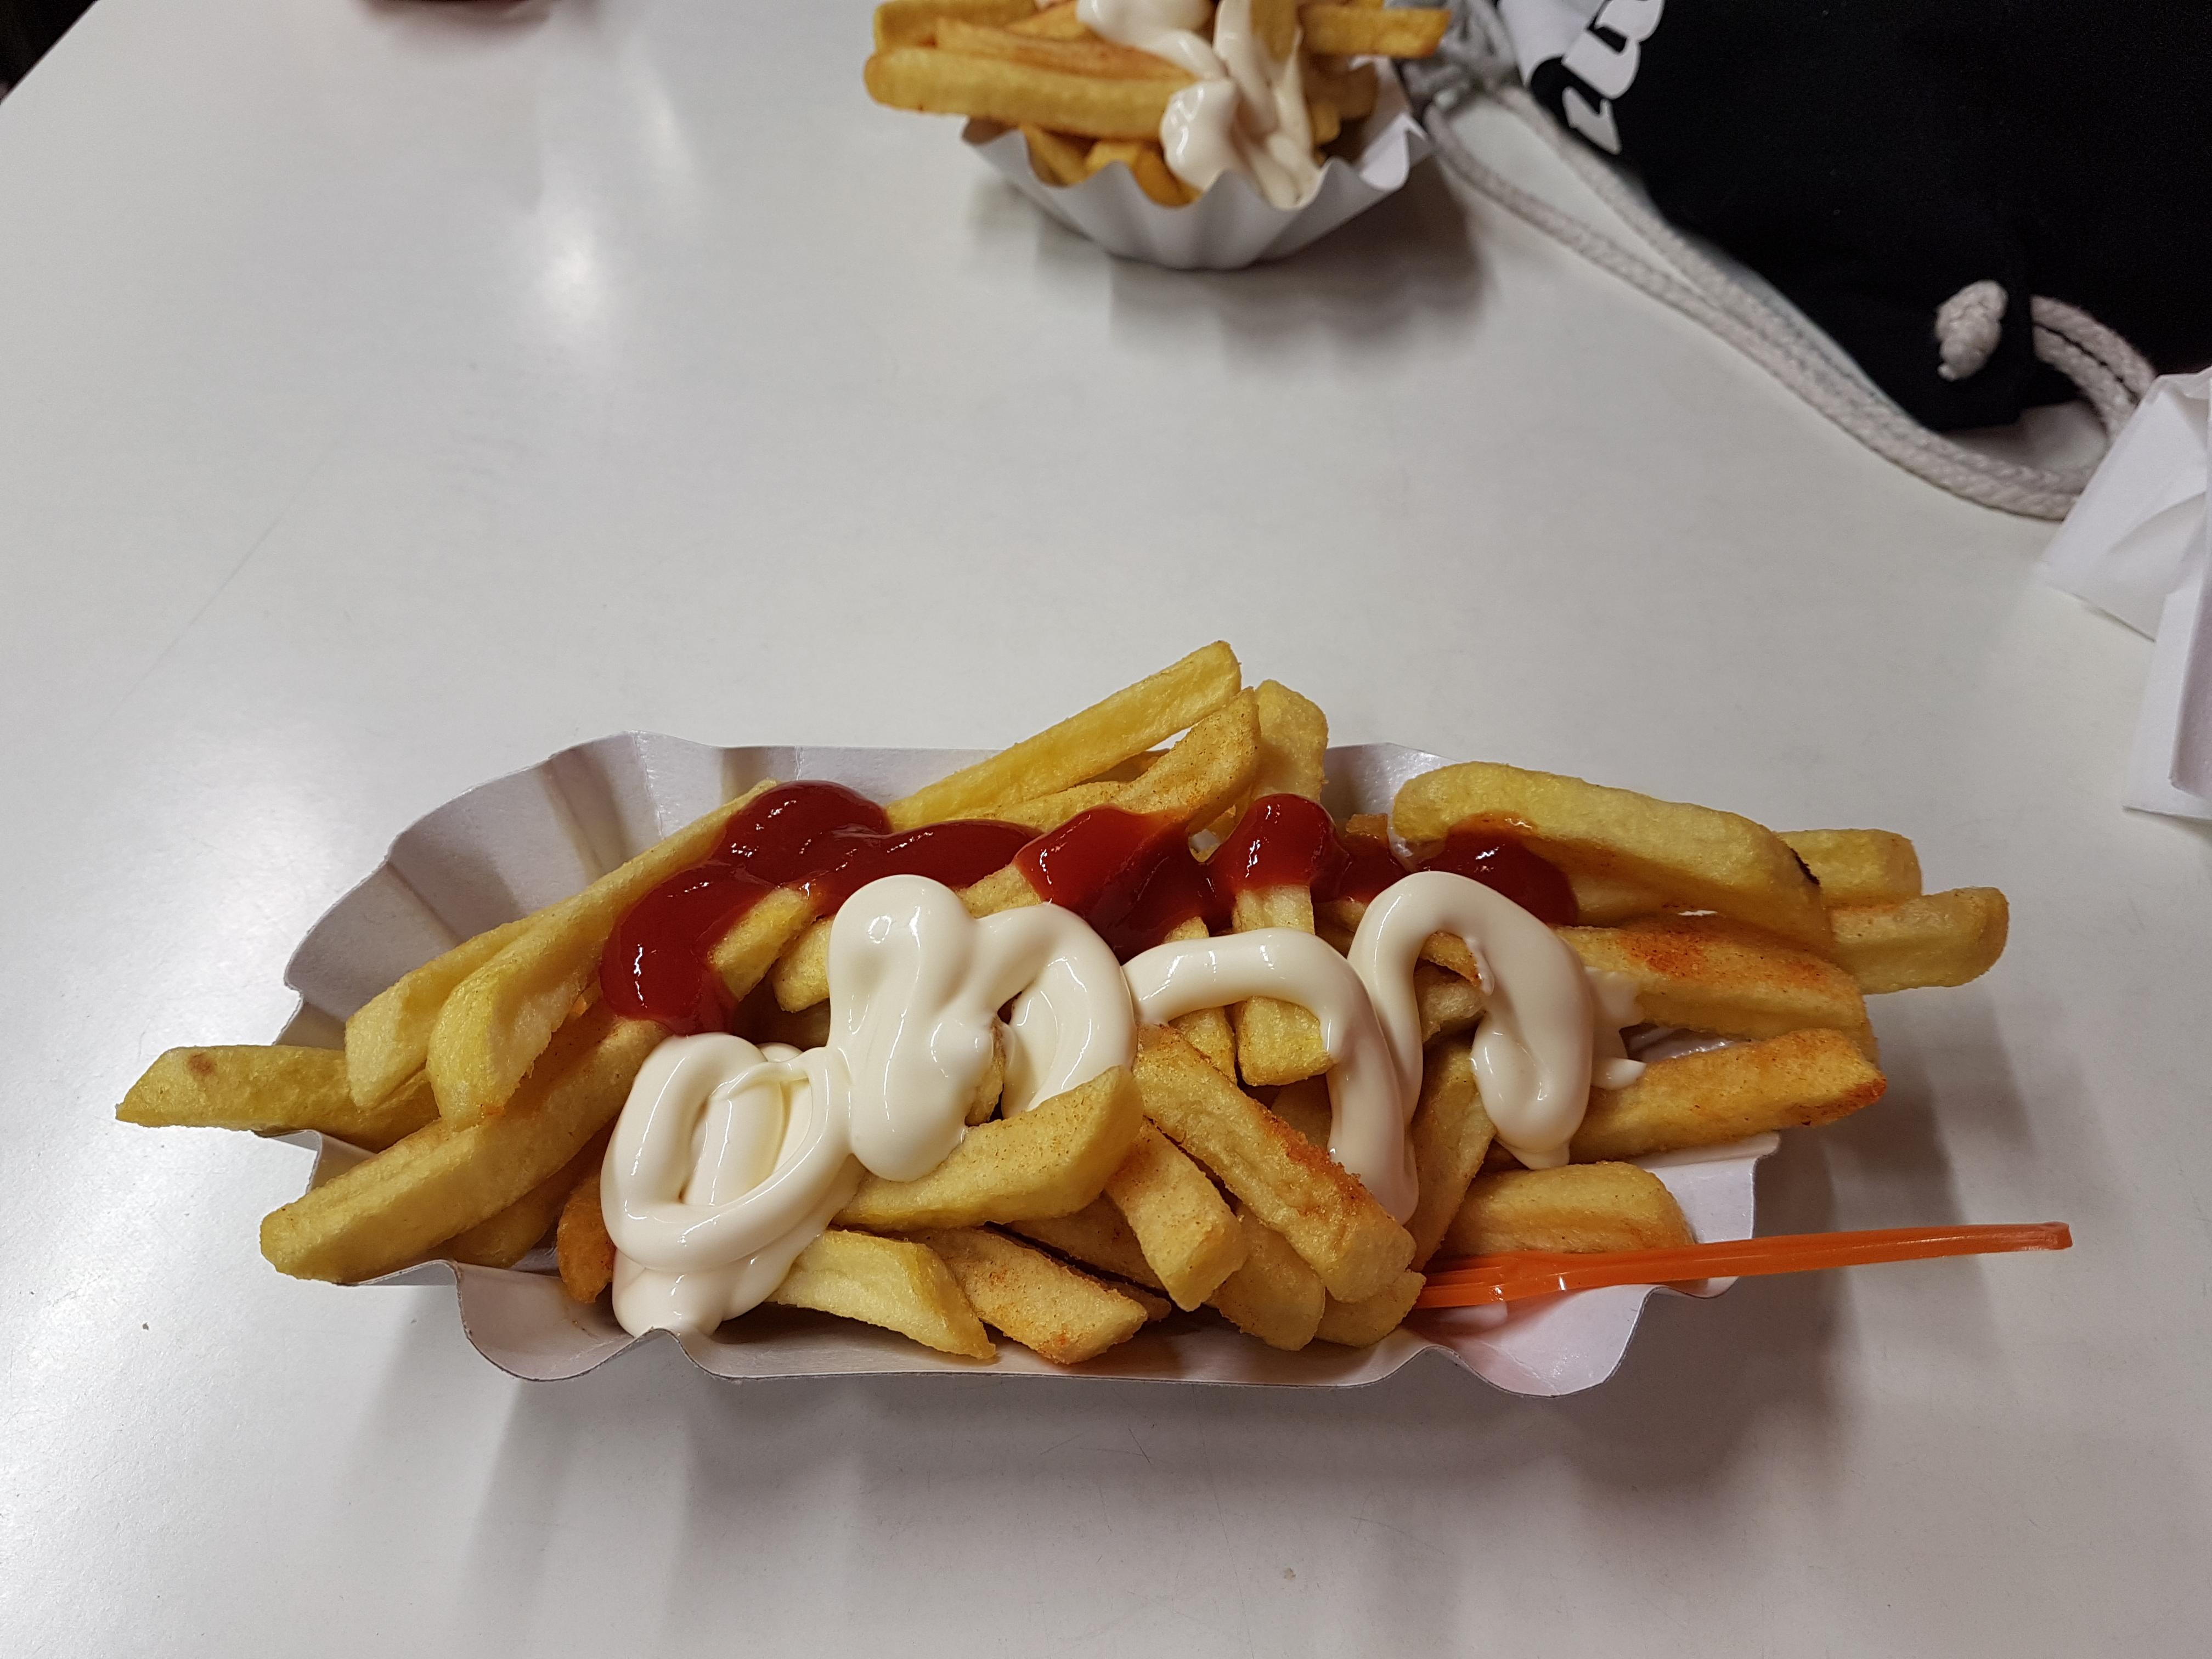 http://foodloader.net/Holz_2017-06-19_Pommes.jpg